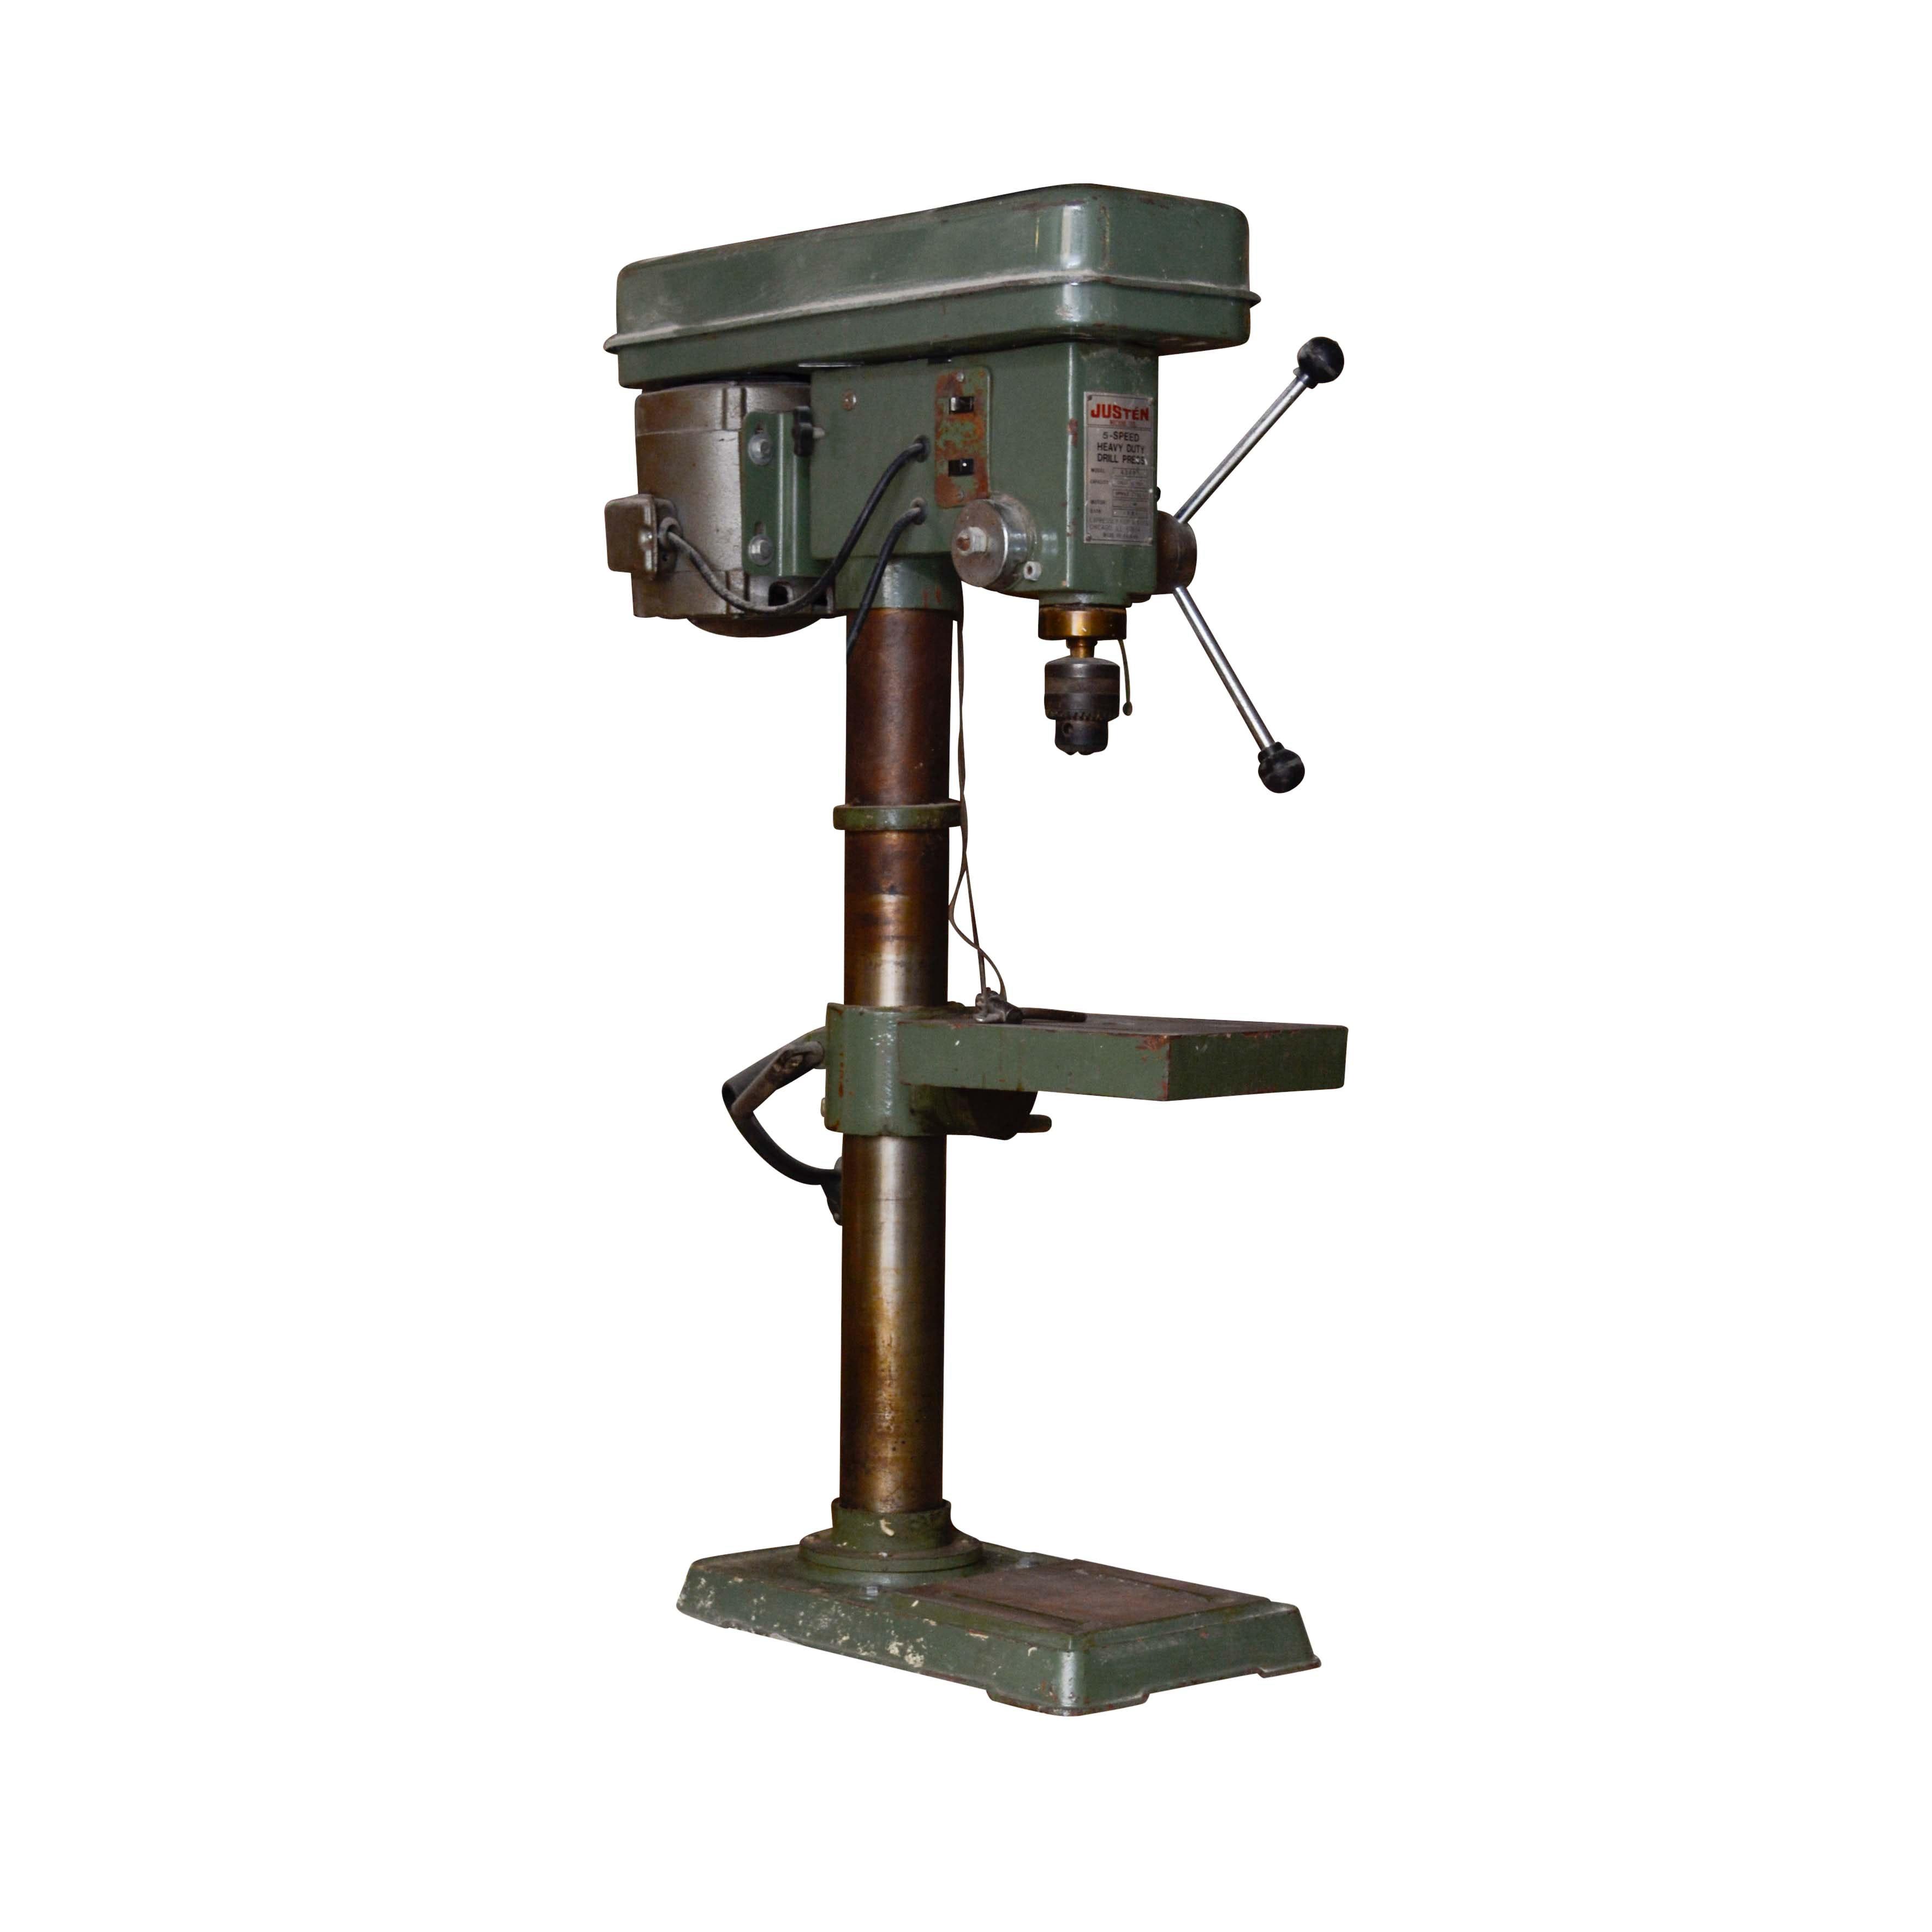 Justen Five-Speed Bench Model Drill Press